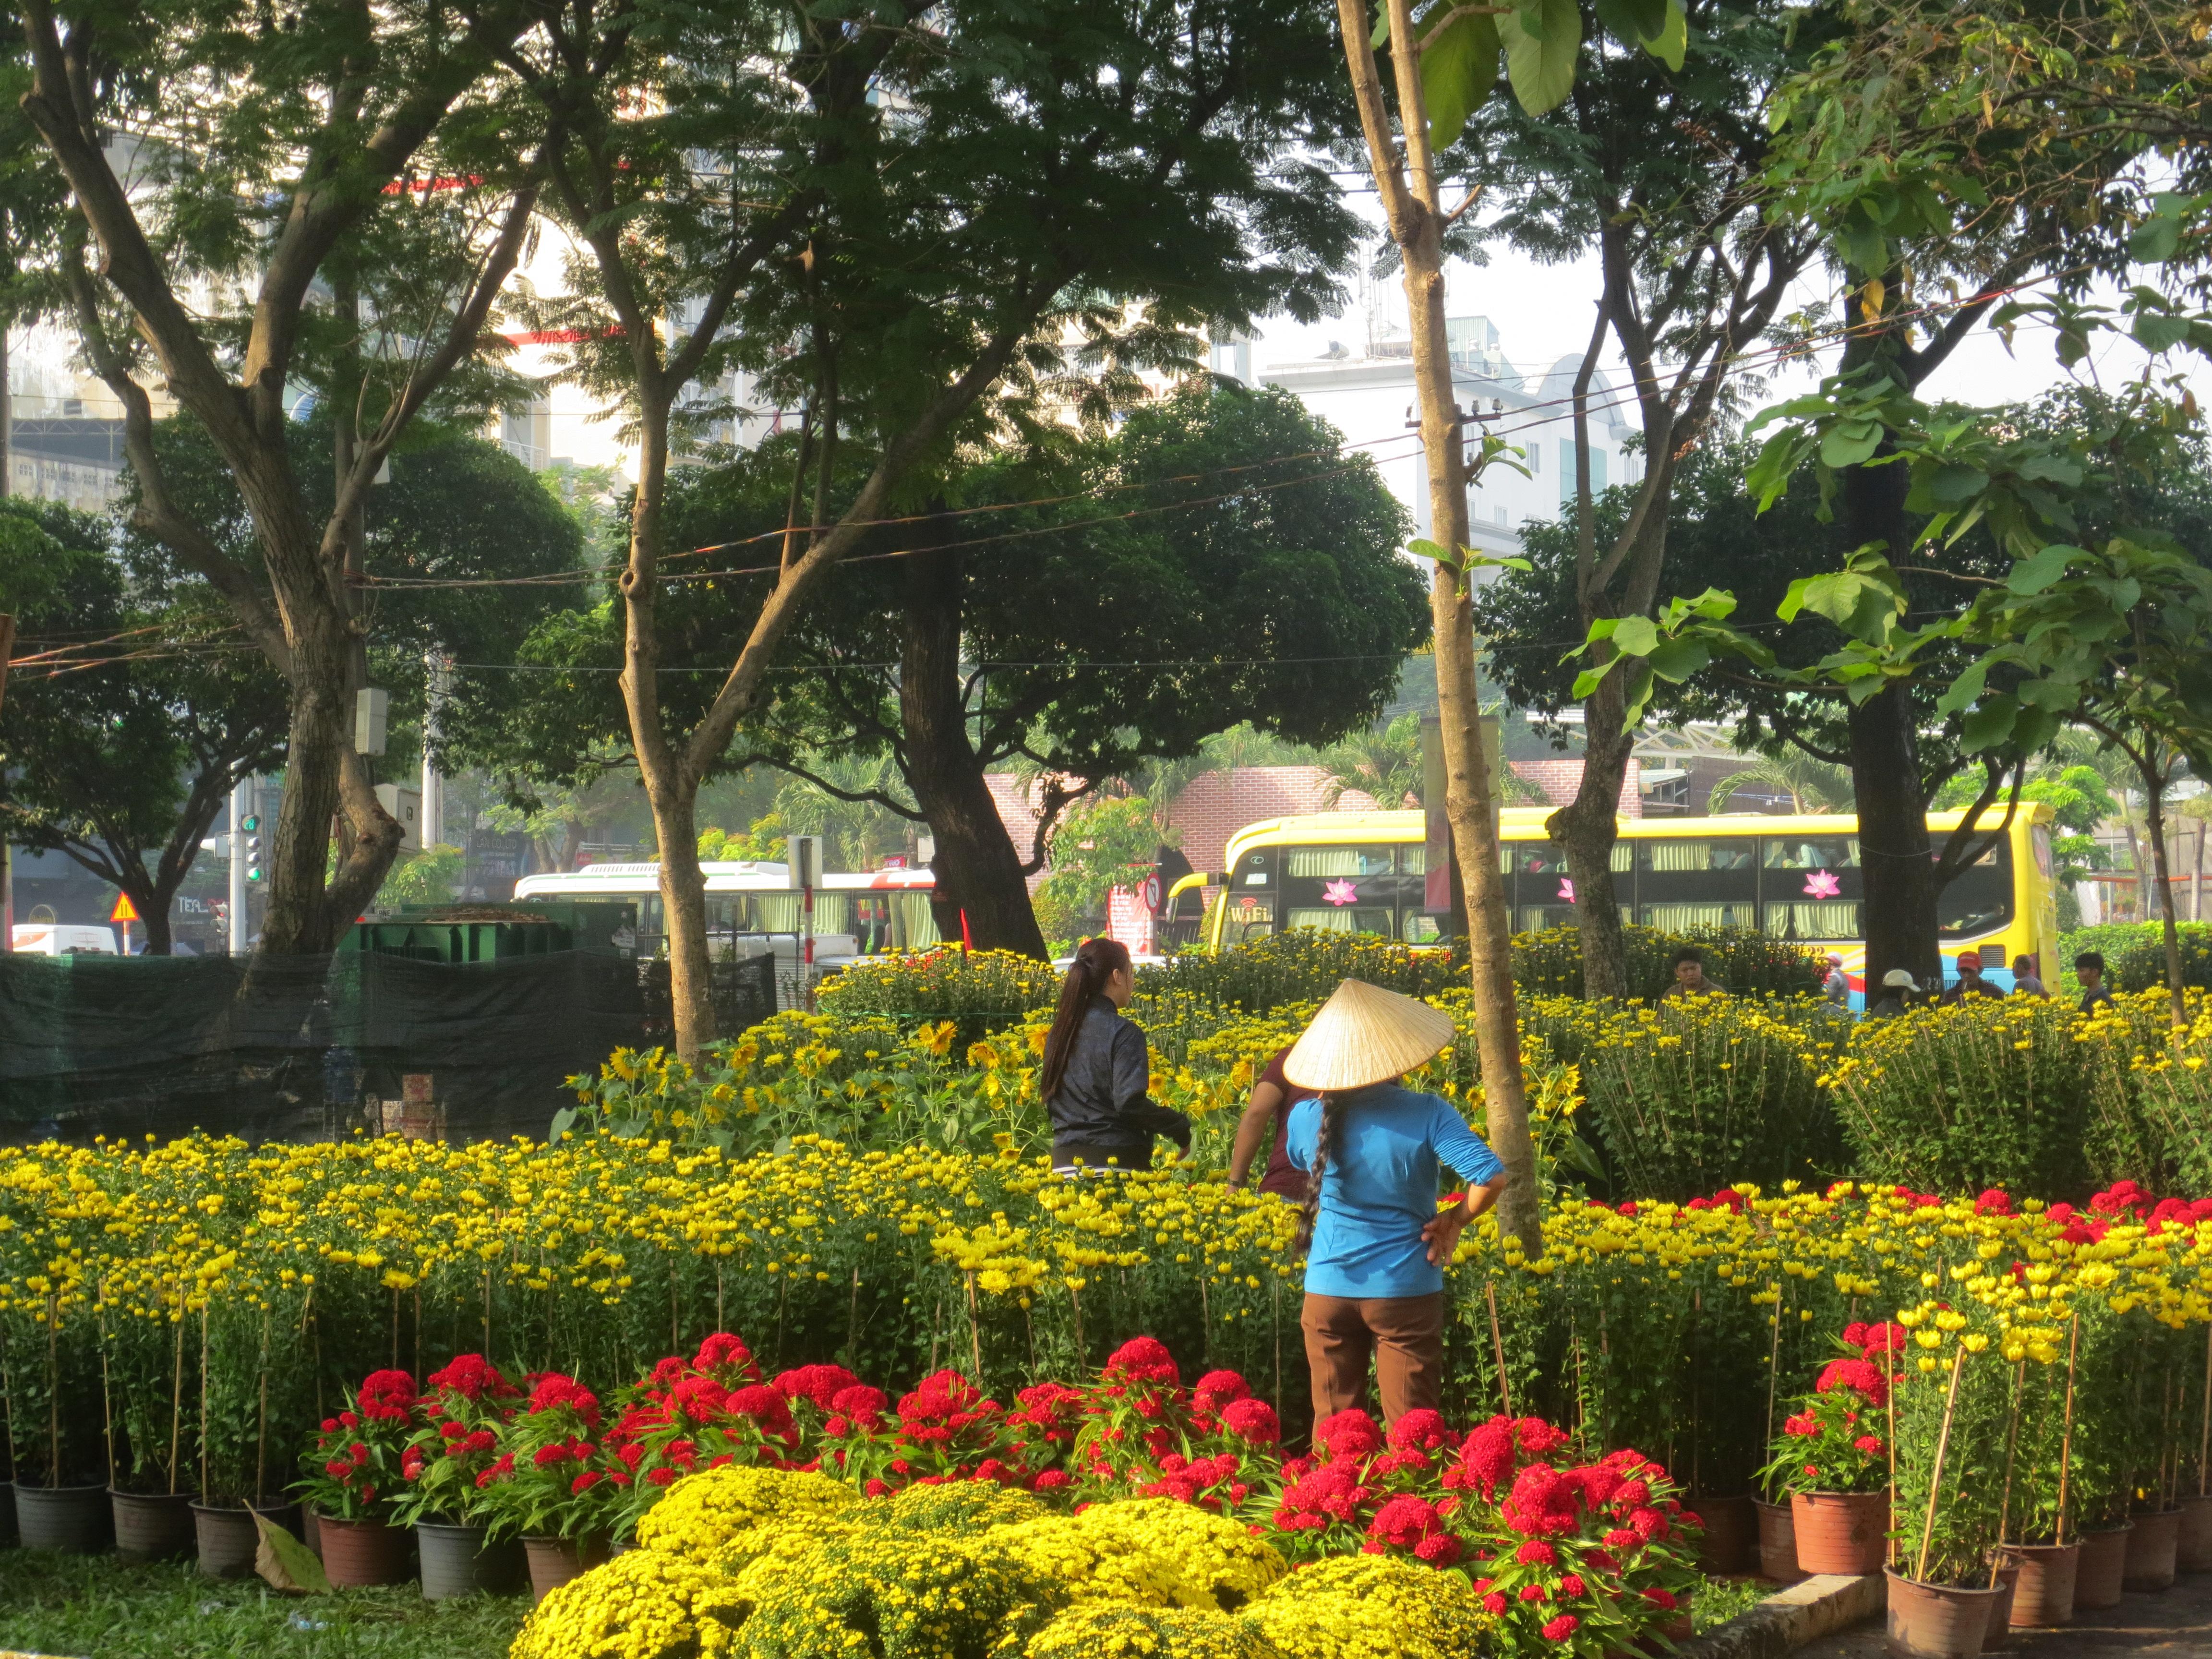 23/9 Park (Pham Ngu Lao Street near Ben Thanh Market, Dist.1